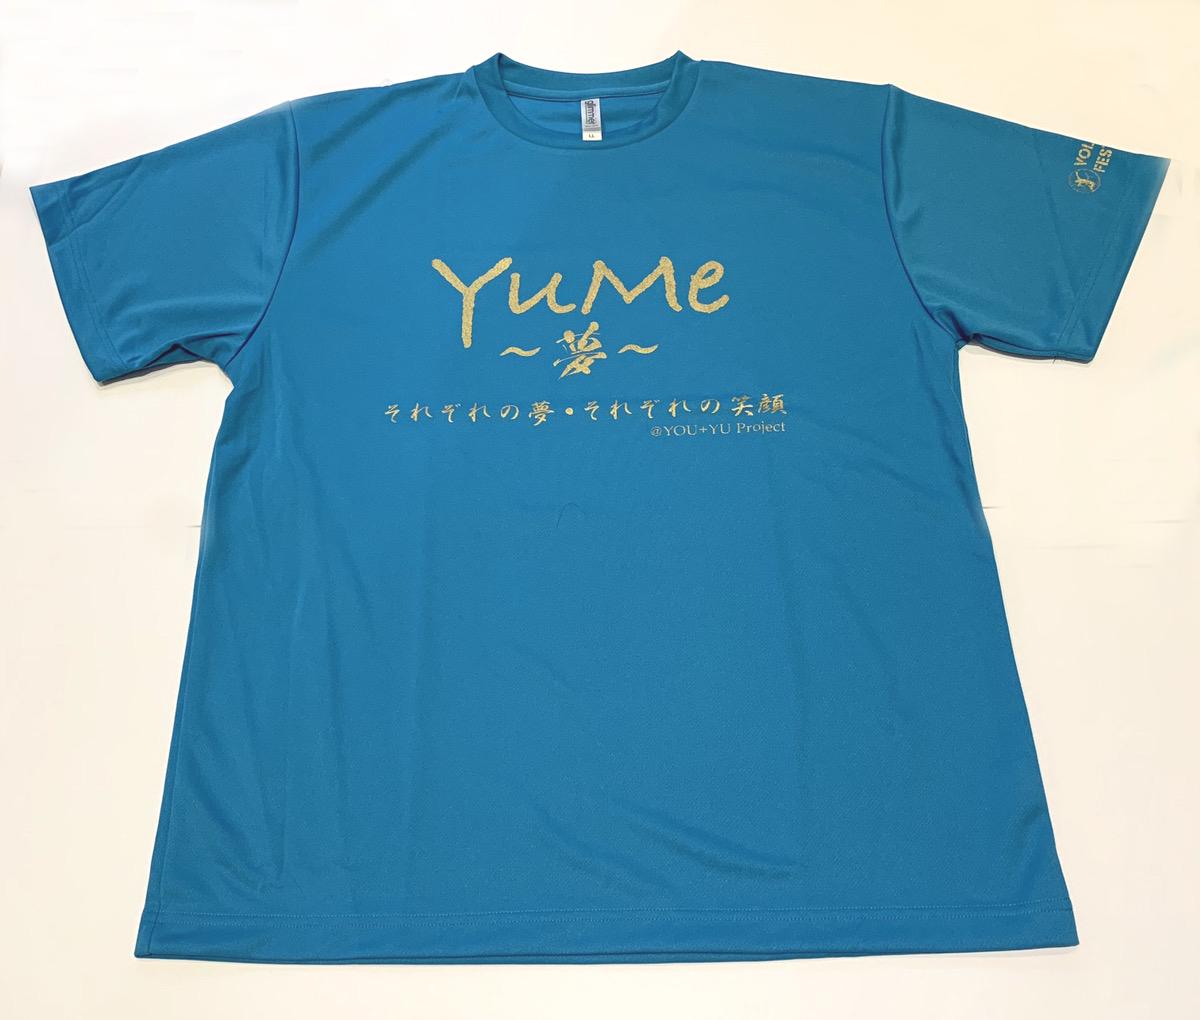 VOREAS越川選手企画 夢プロジェクト T-シャツ(ターコイズブルー)